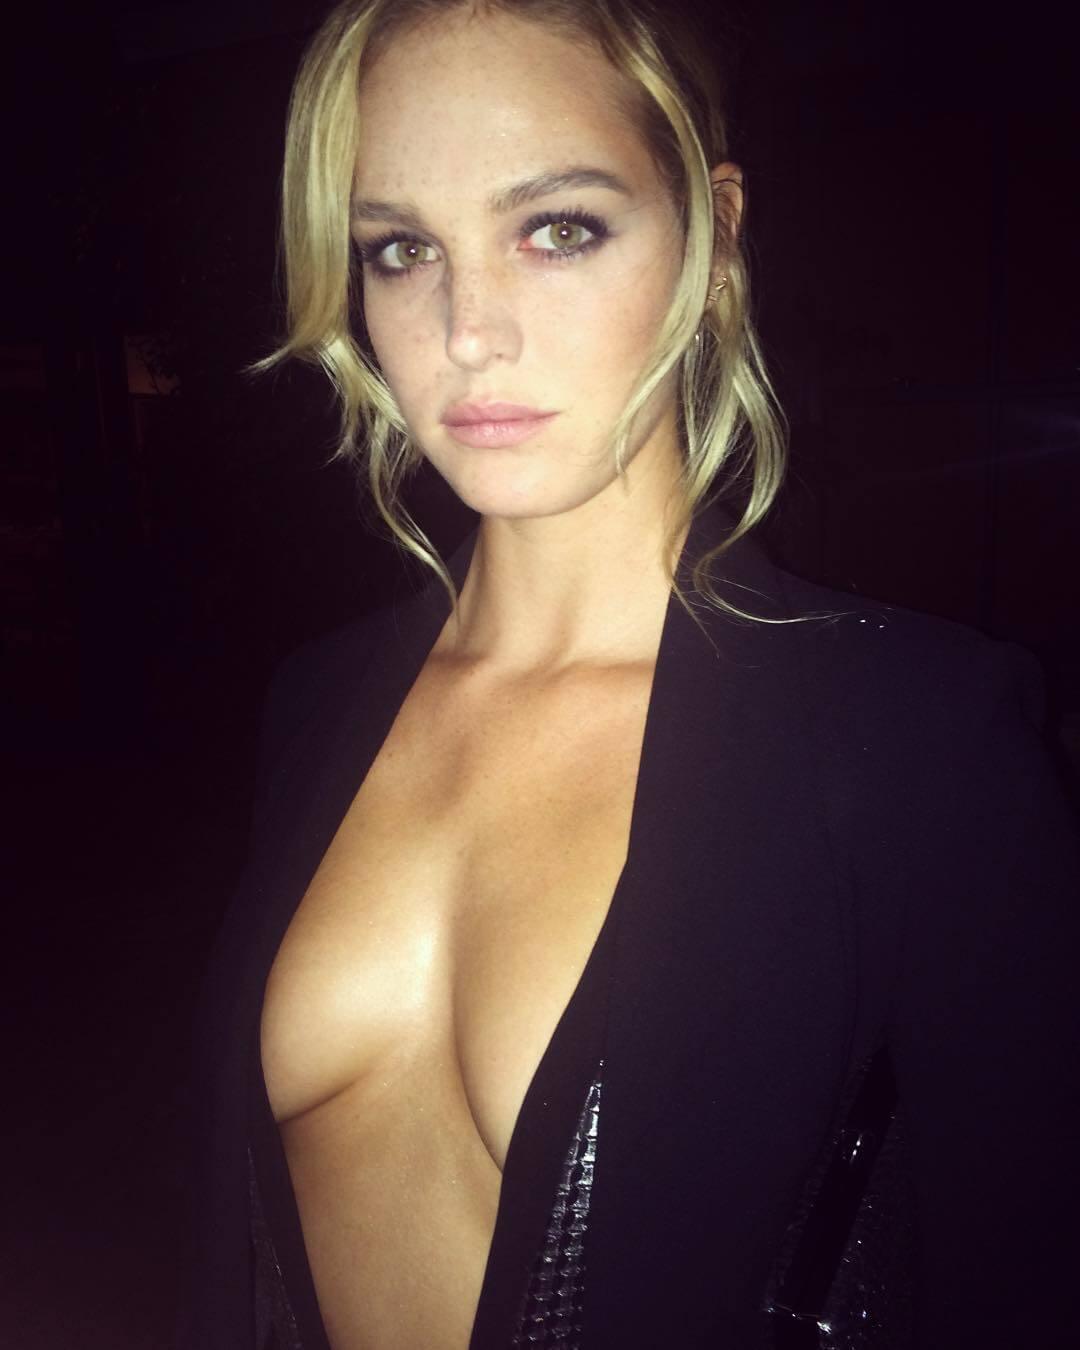 Erin Heatherton sexy cleavage pics